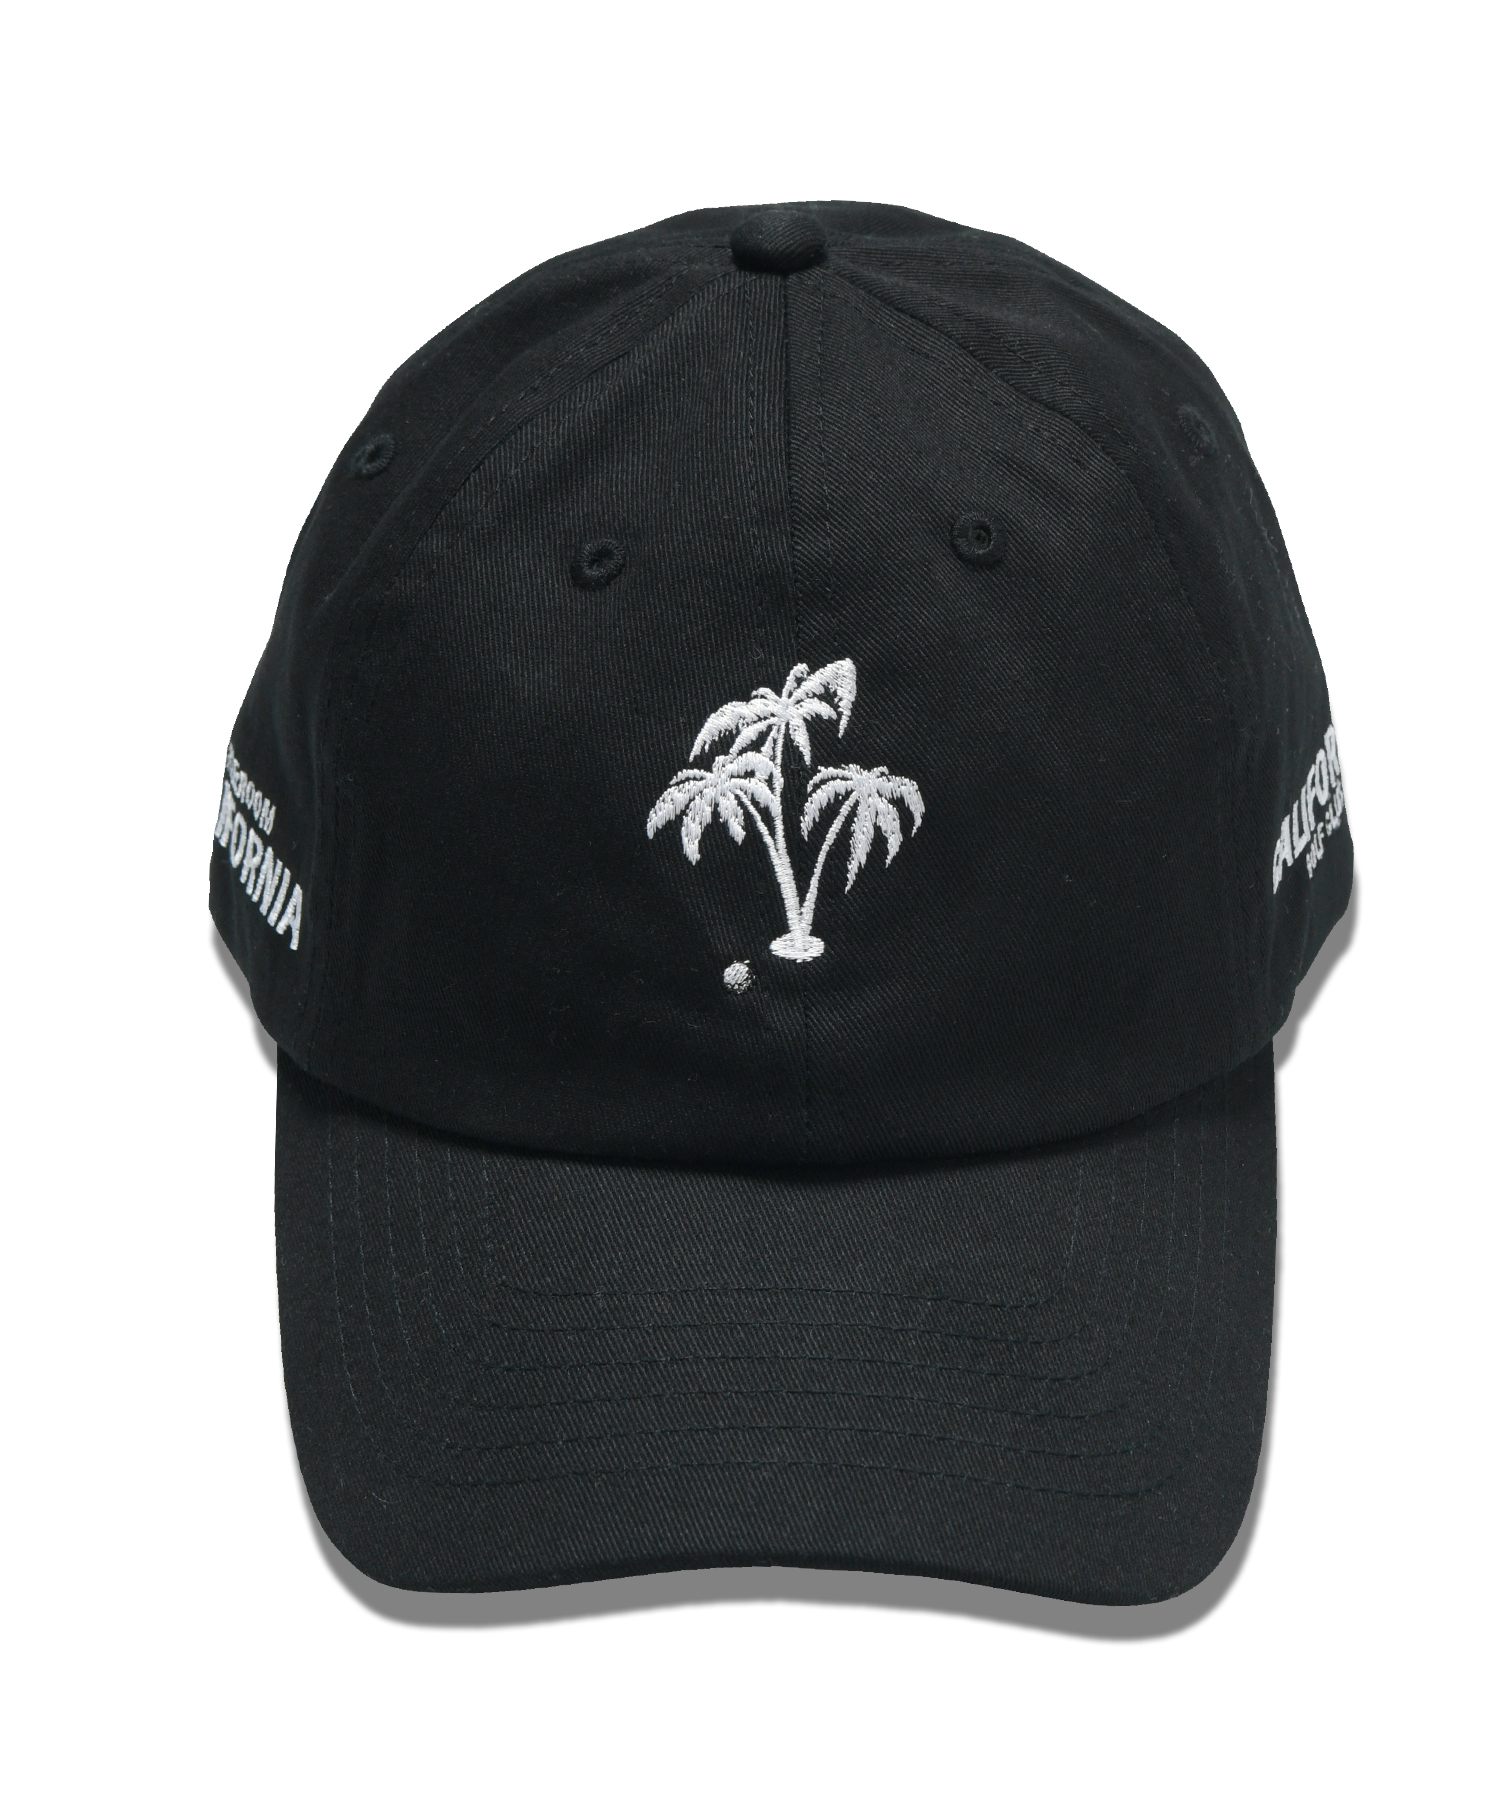 GOLF ICON EMBROIDERY TWILL CAP[RGH001]